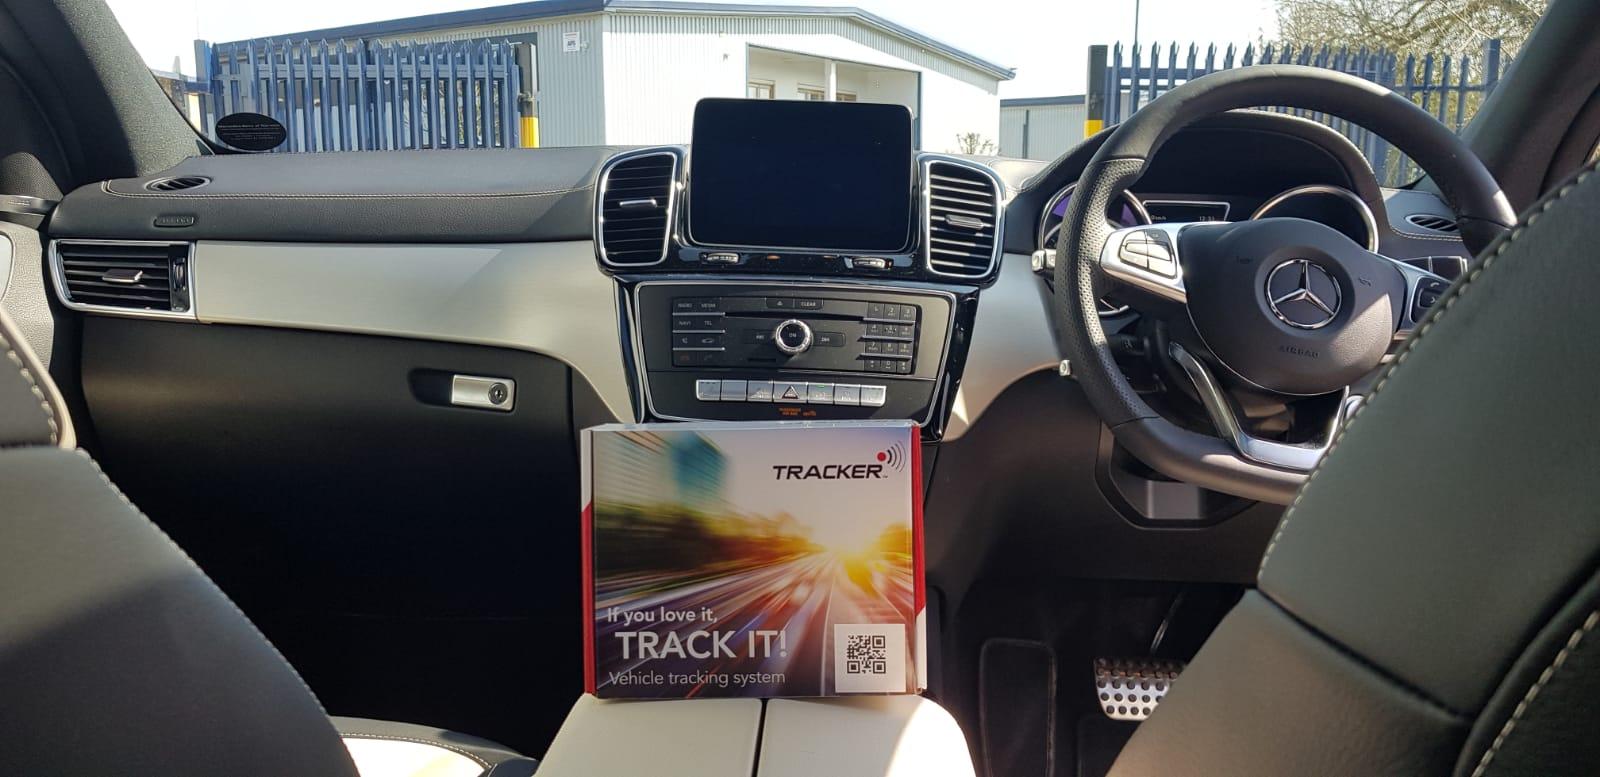 Mercedes Tracker Vantage S7